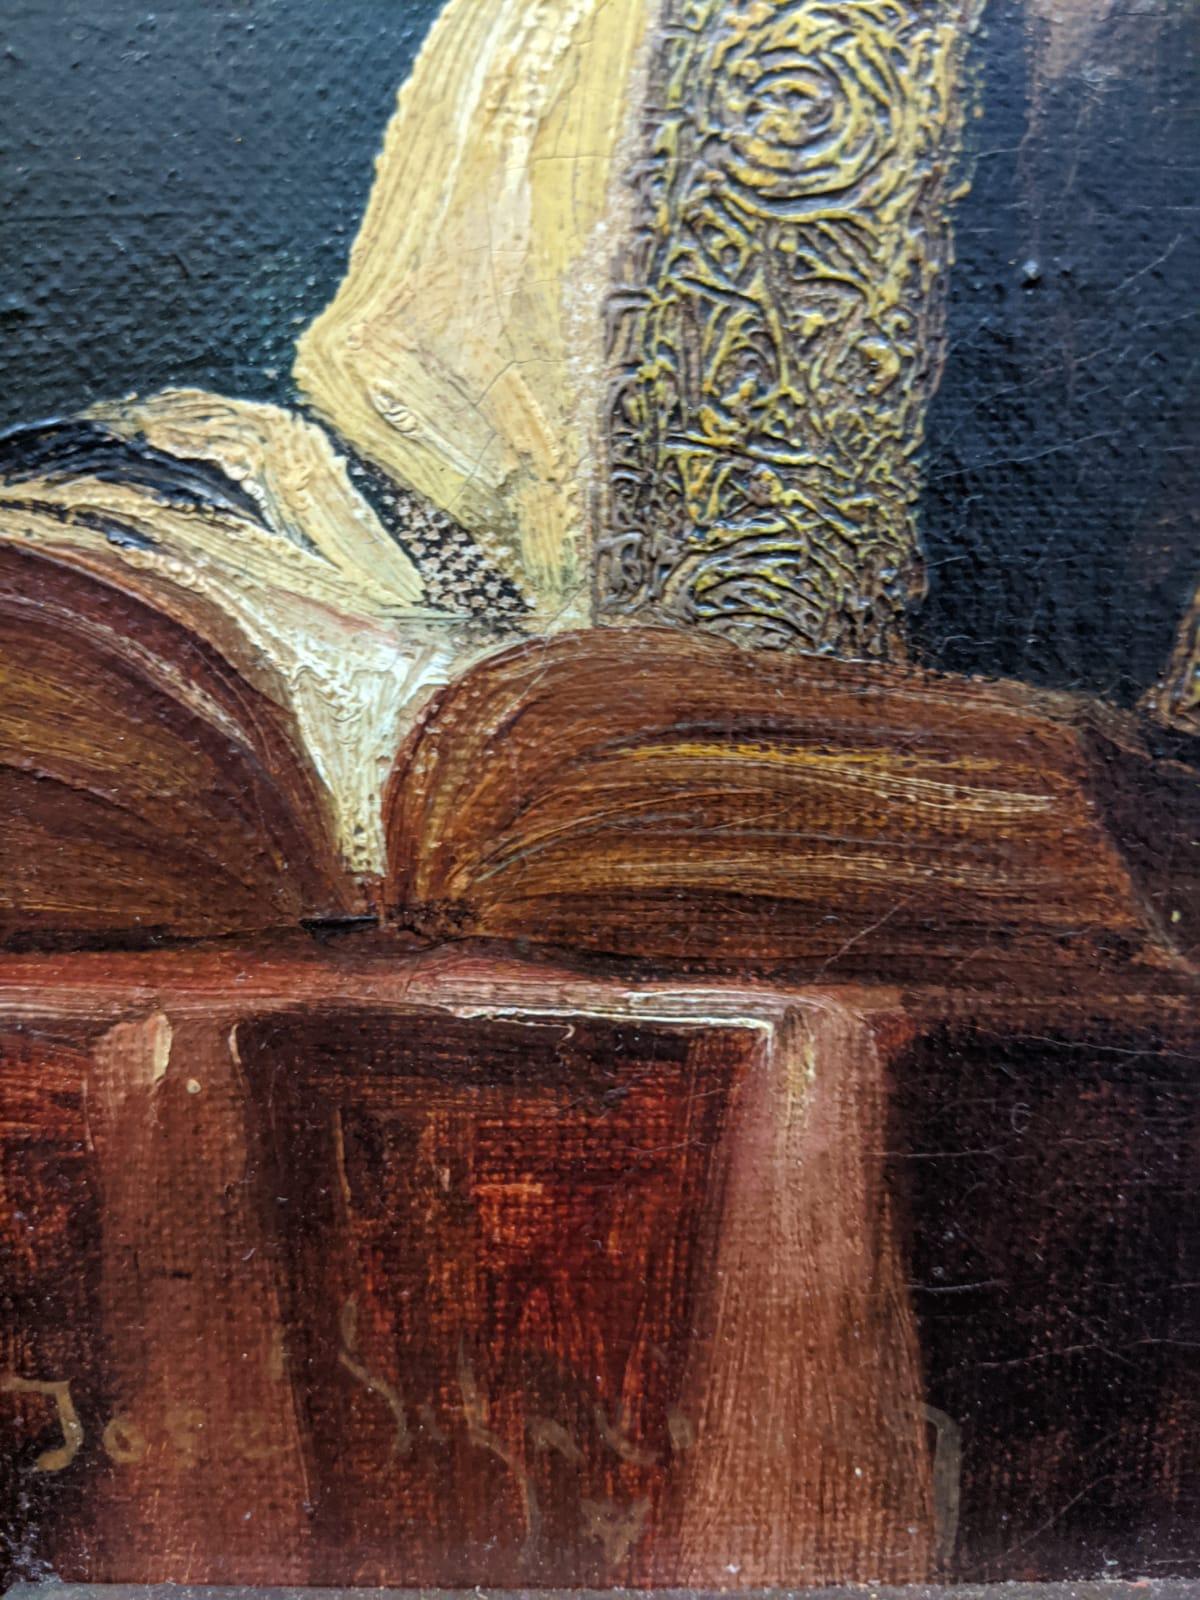 Jose Schneider (American/Spanish, 1848-1893), Rabbi Studying and Rabbi, oils on canvas, both - Image 7 of 7